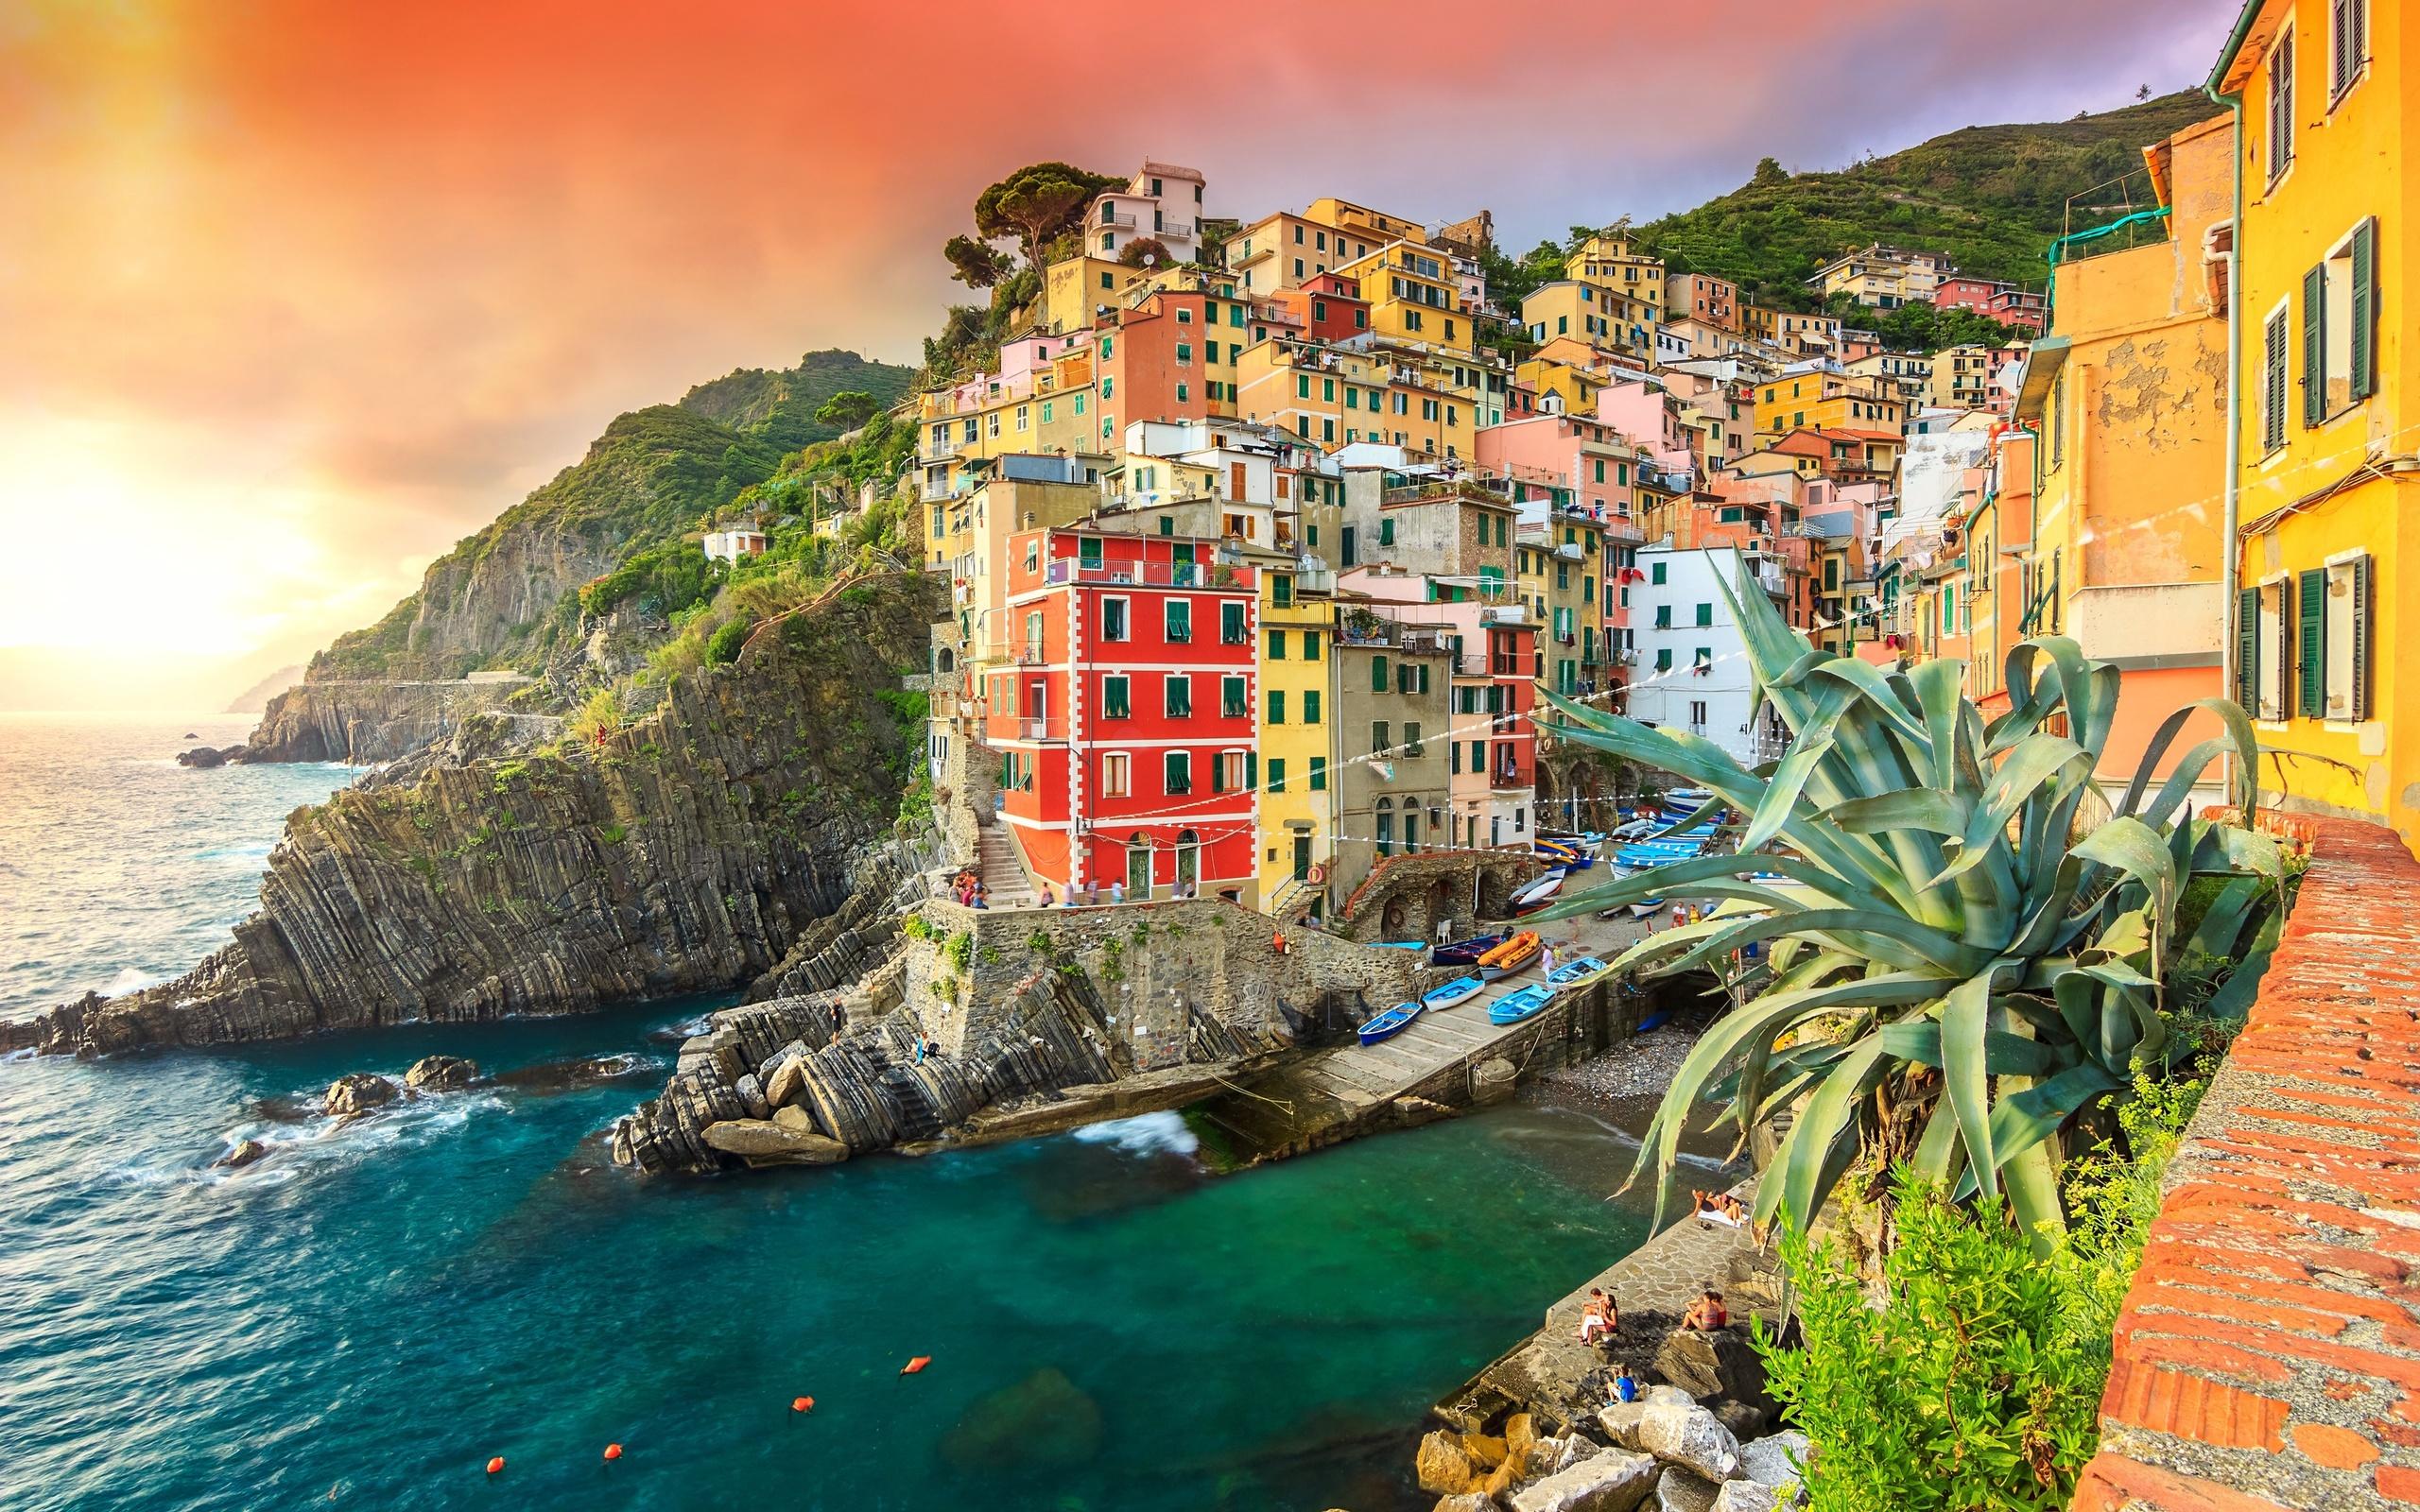 италия, дома, бухта, лодки, побережье, риомаджоре, небо, закат, Чинкве-терре, море, скалы, побережье, riomaggiore, лигурия, liguria